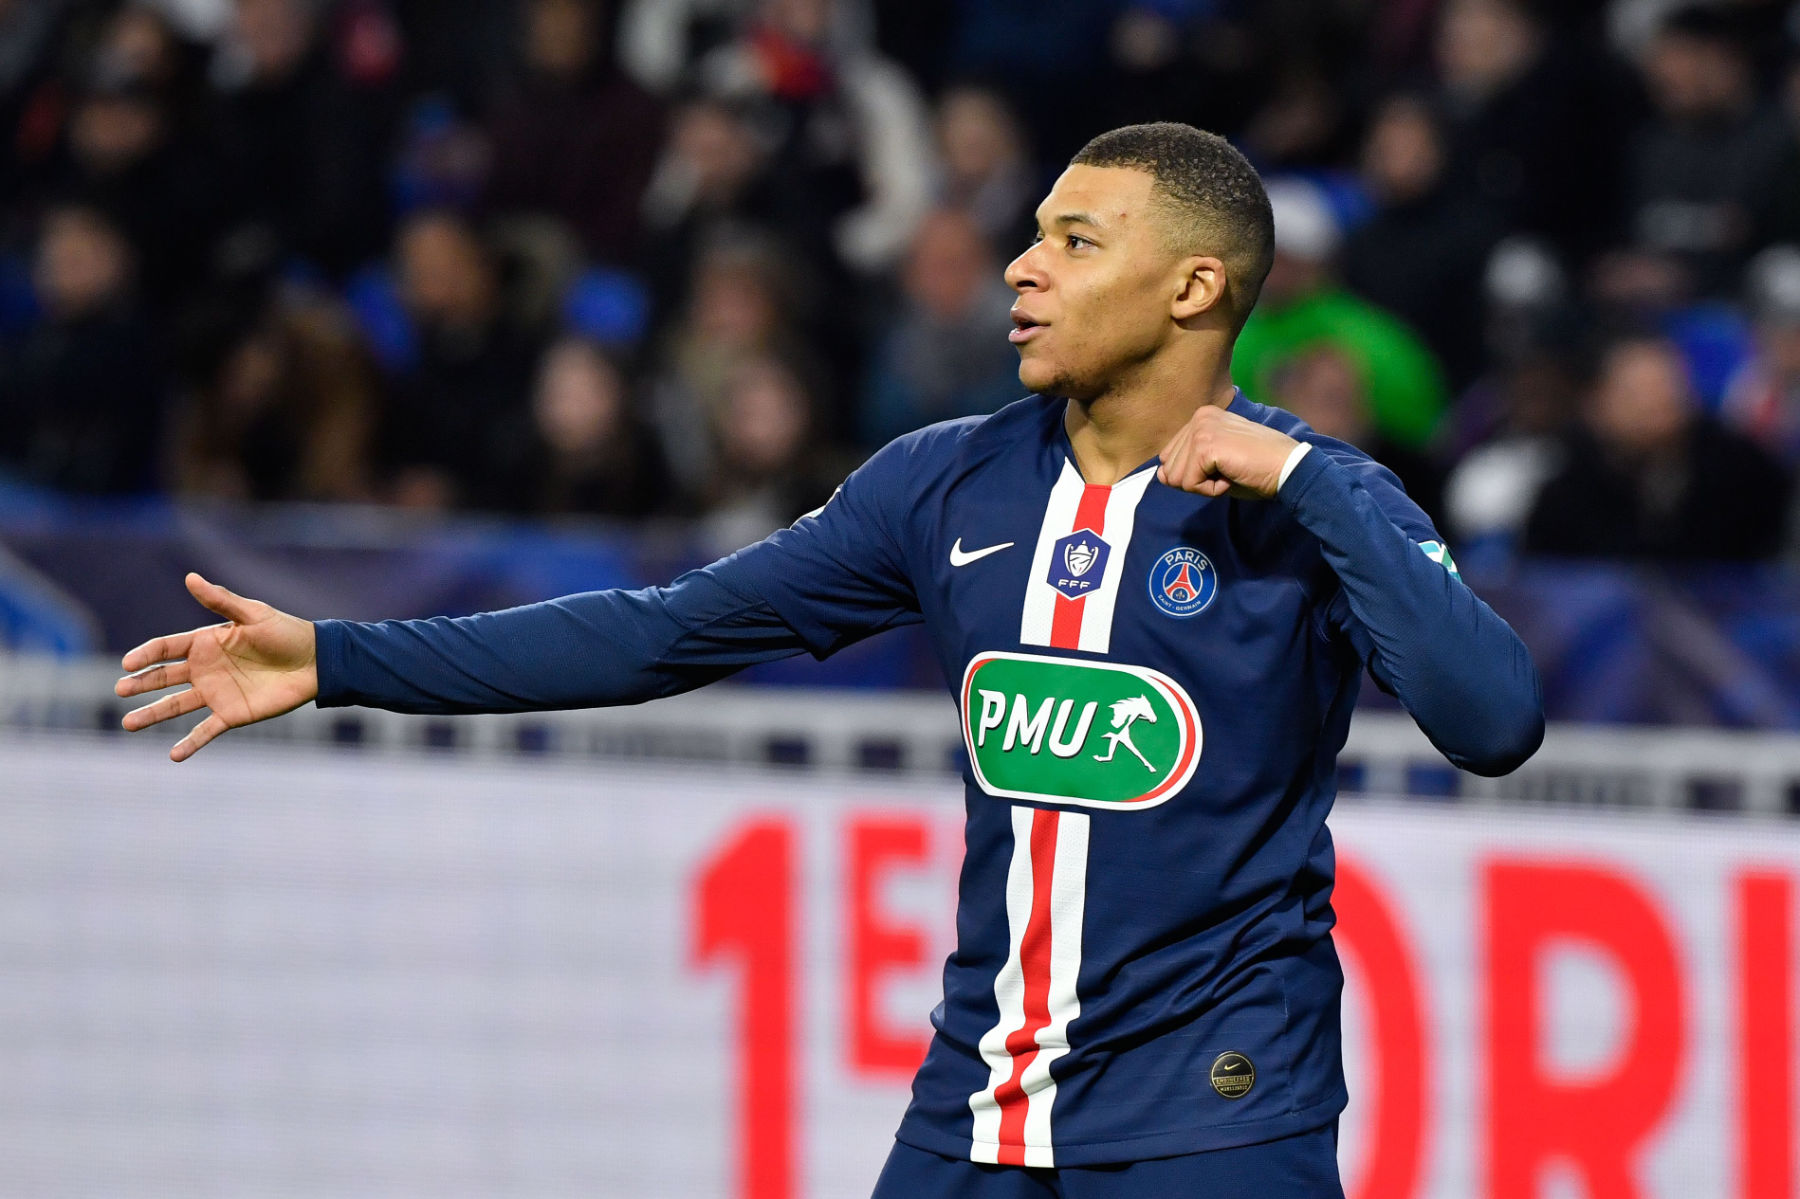 PSG vs Lyon Highlights & Goals Video 09.02.2020  |Psg- Lyon